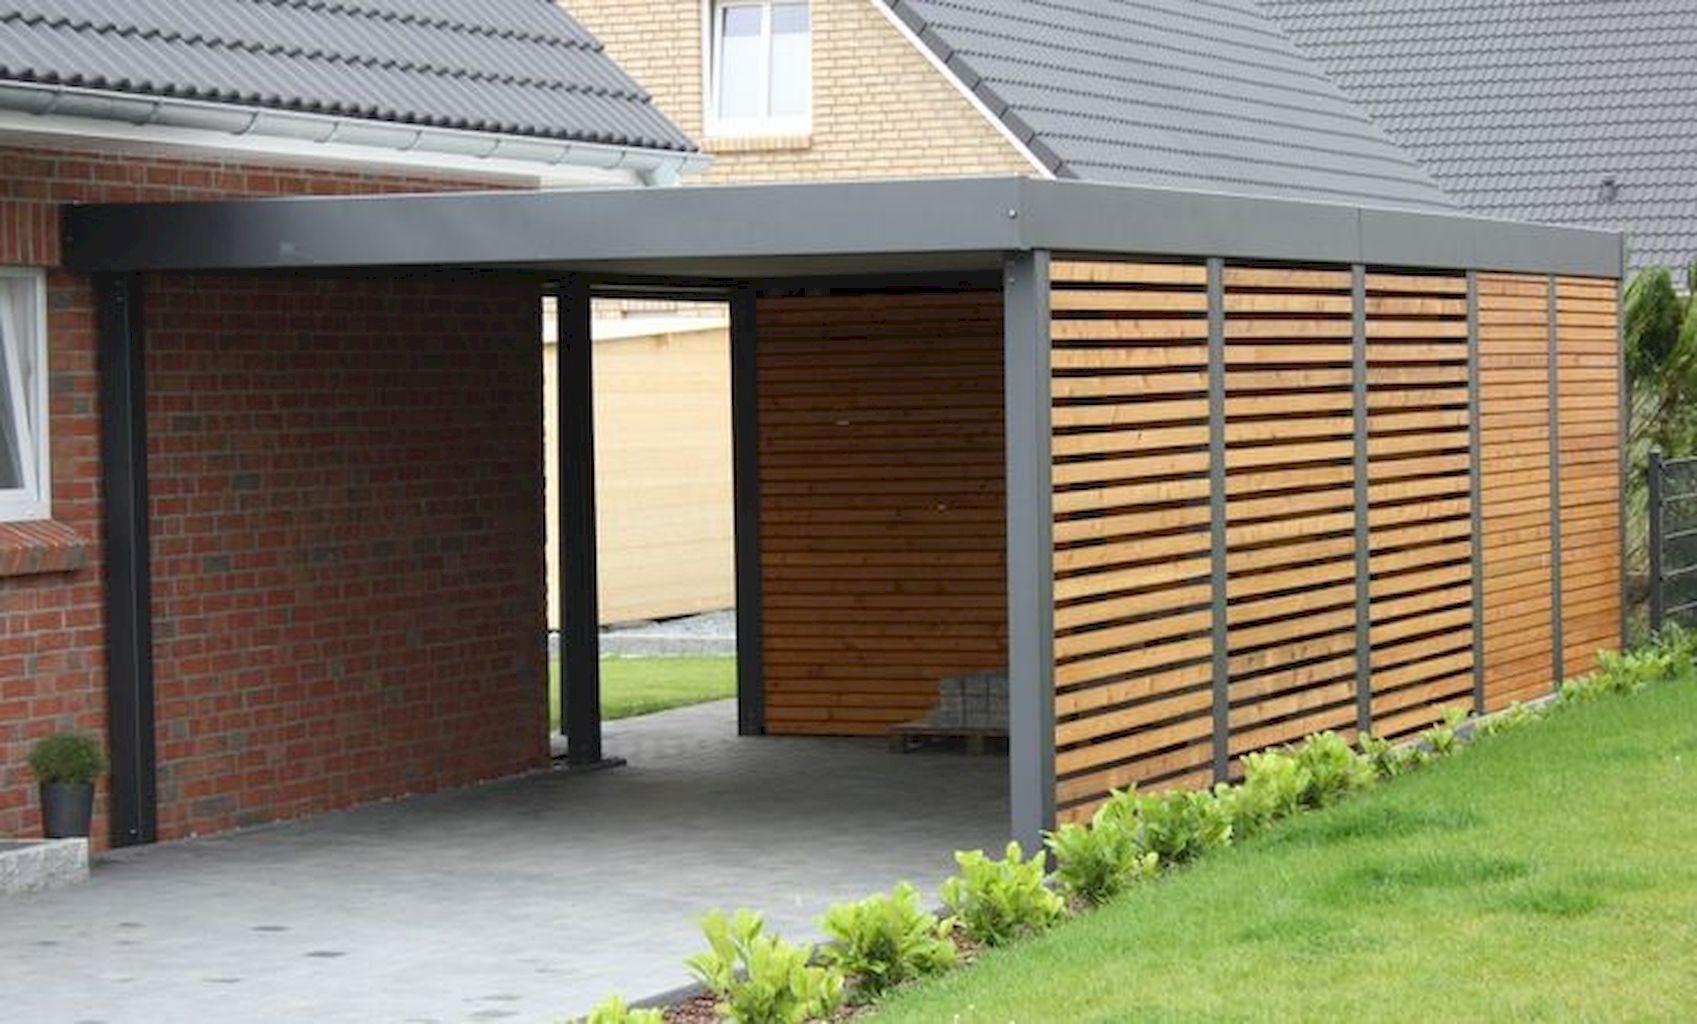 Adorable modern carports garage designs ideas (7) | Farmhouse Chic ...